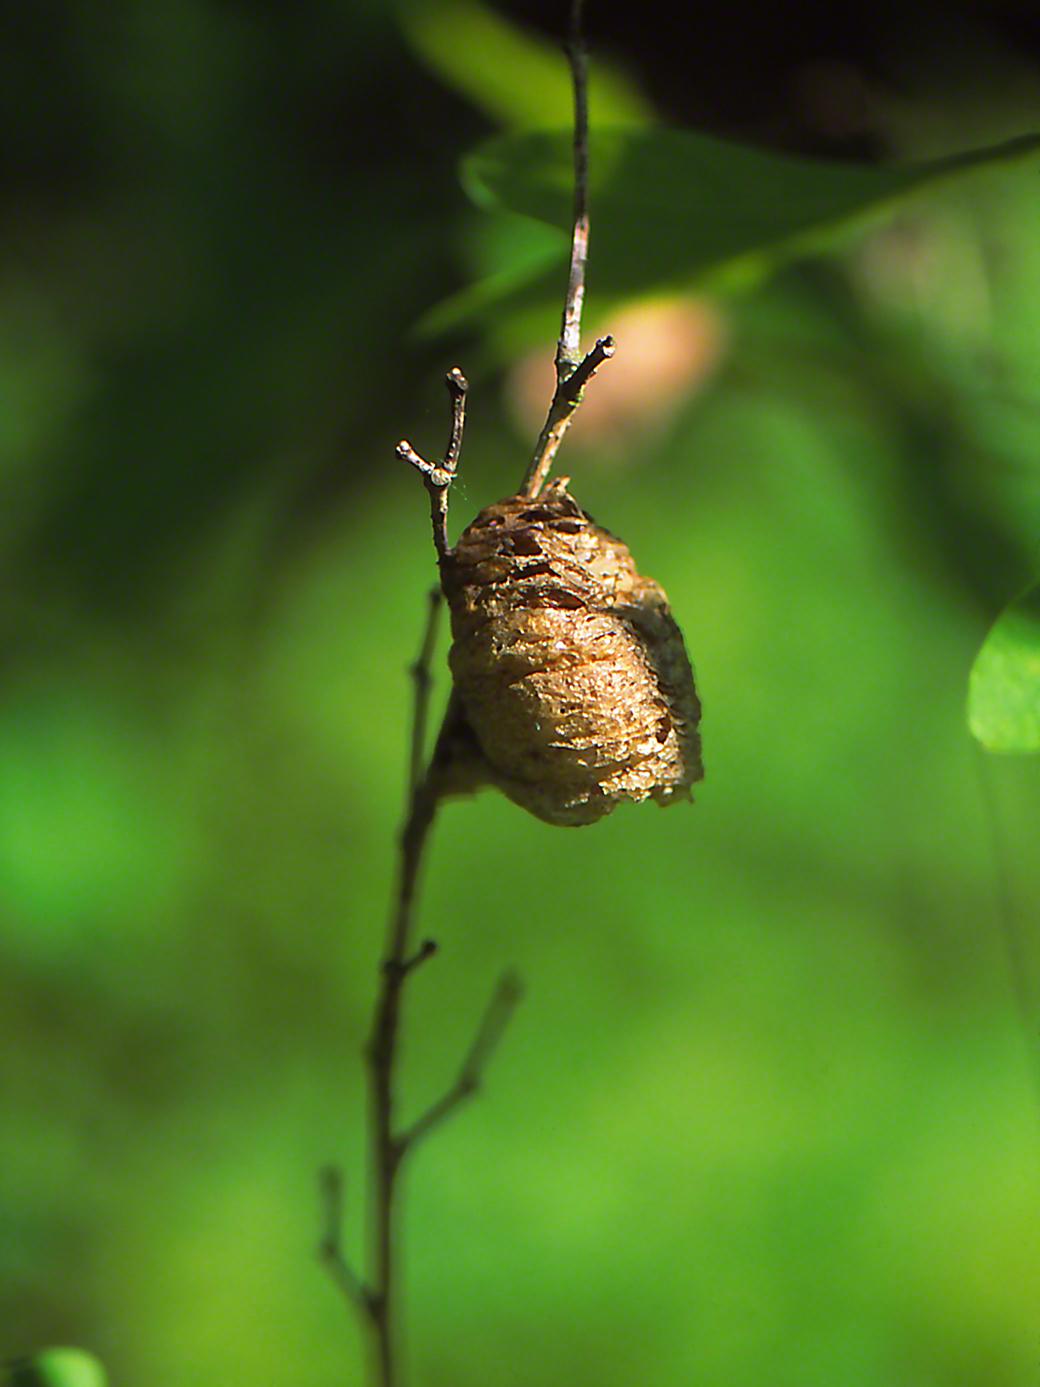 Praying Mantis Eggs Why do we marve...